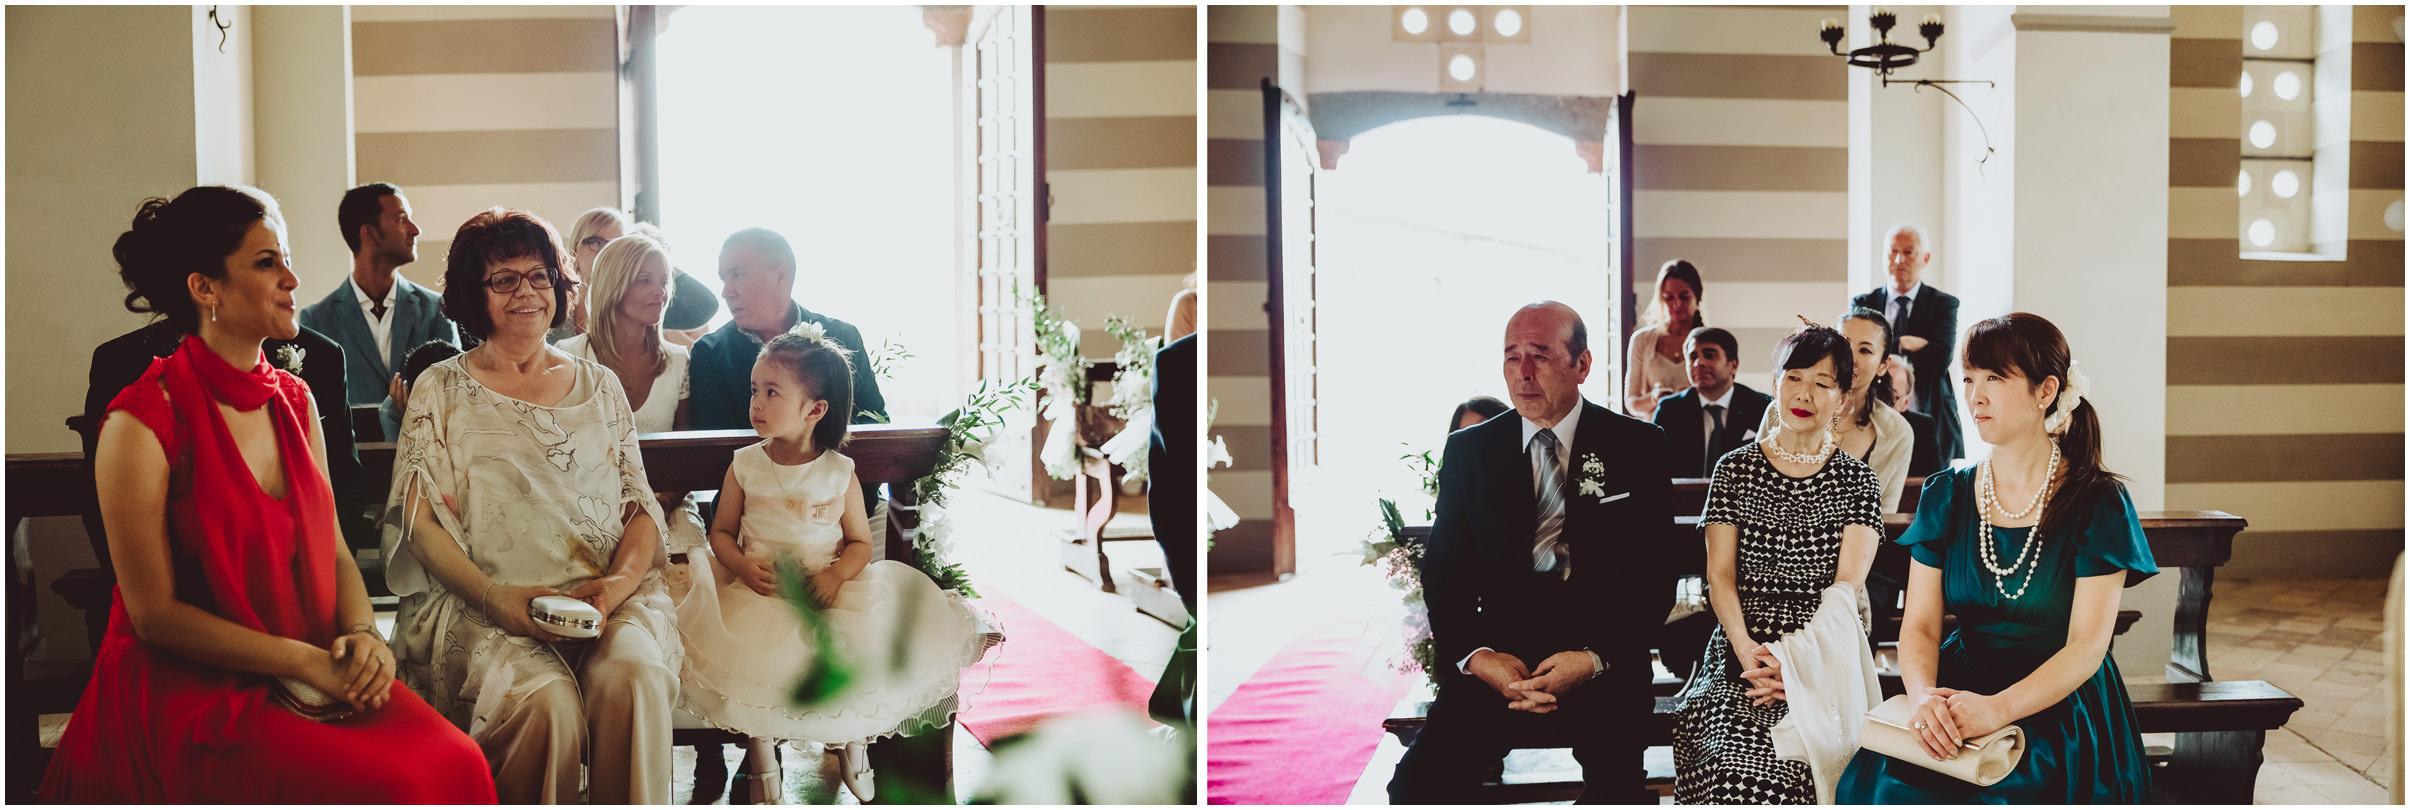 WEDDING-PHOTOGRAPHY-SARA-LORENZONI-FOTOGRAFIA-MATRIMONIO-ORVIETO-JUKA-ANTONELLO12